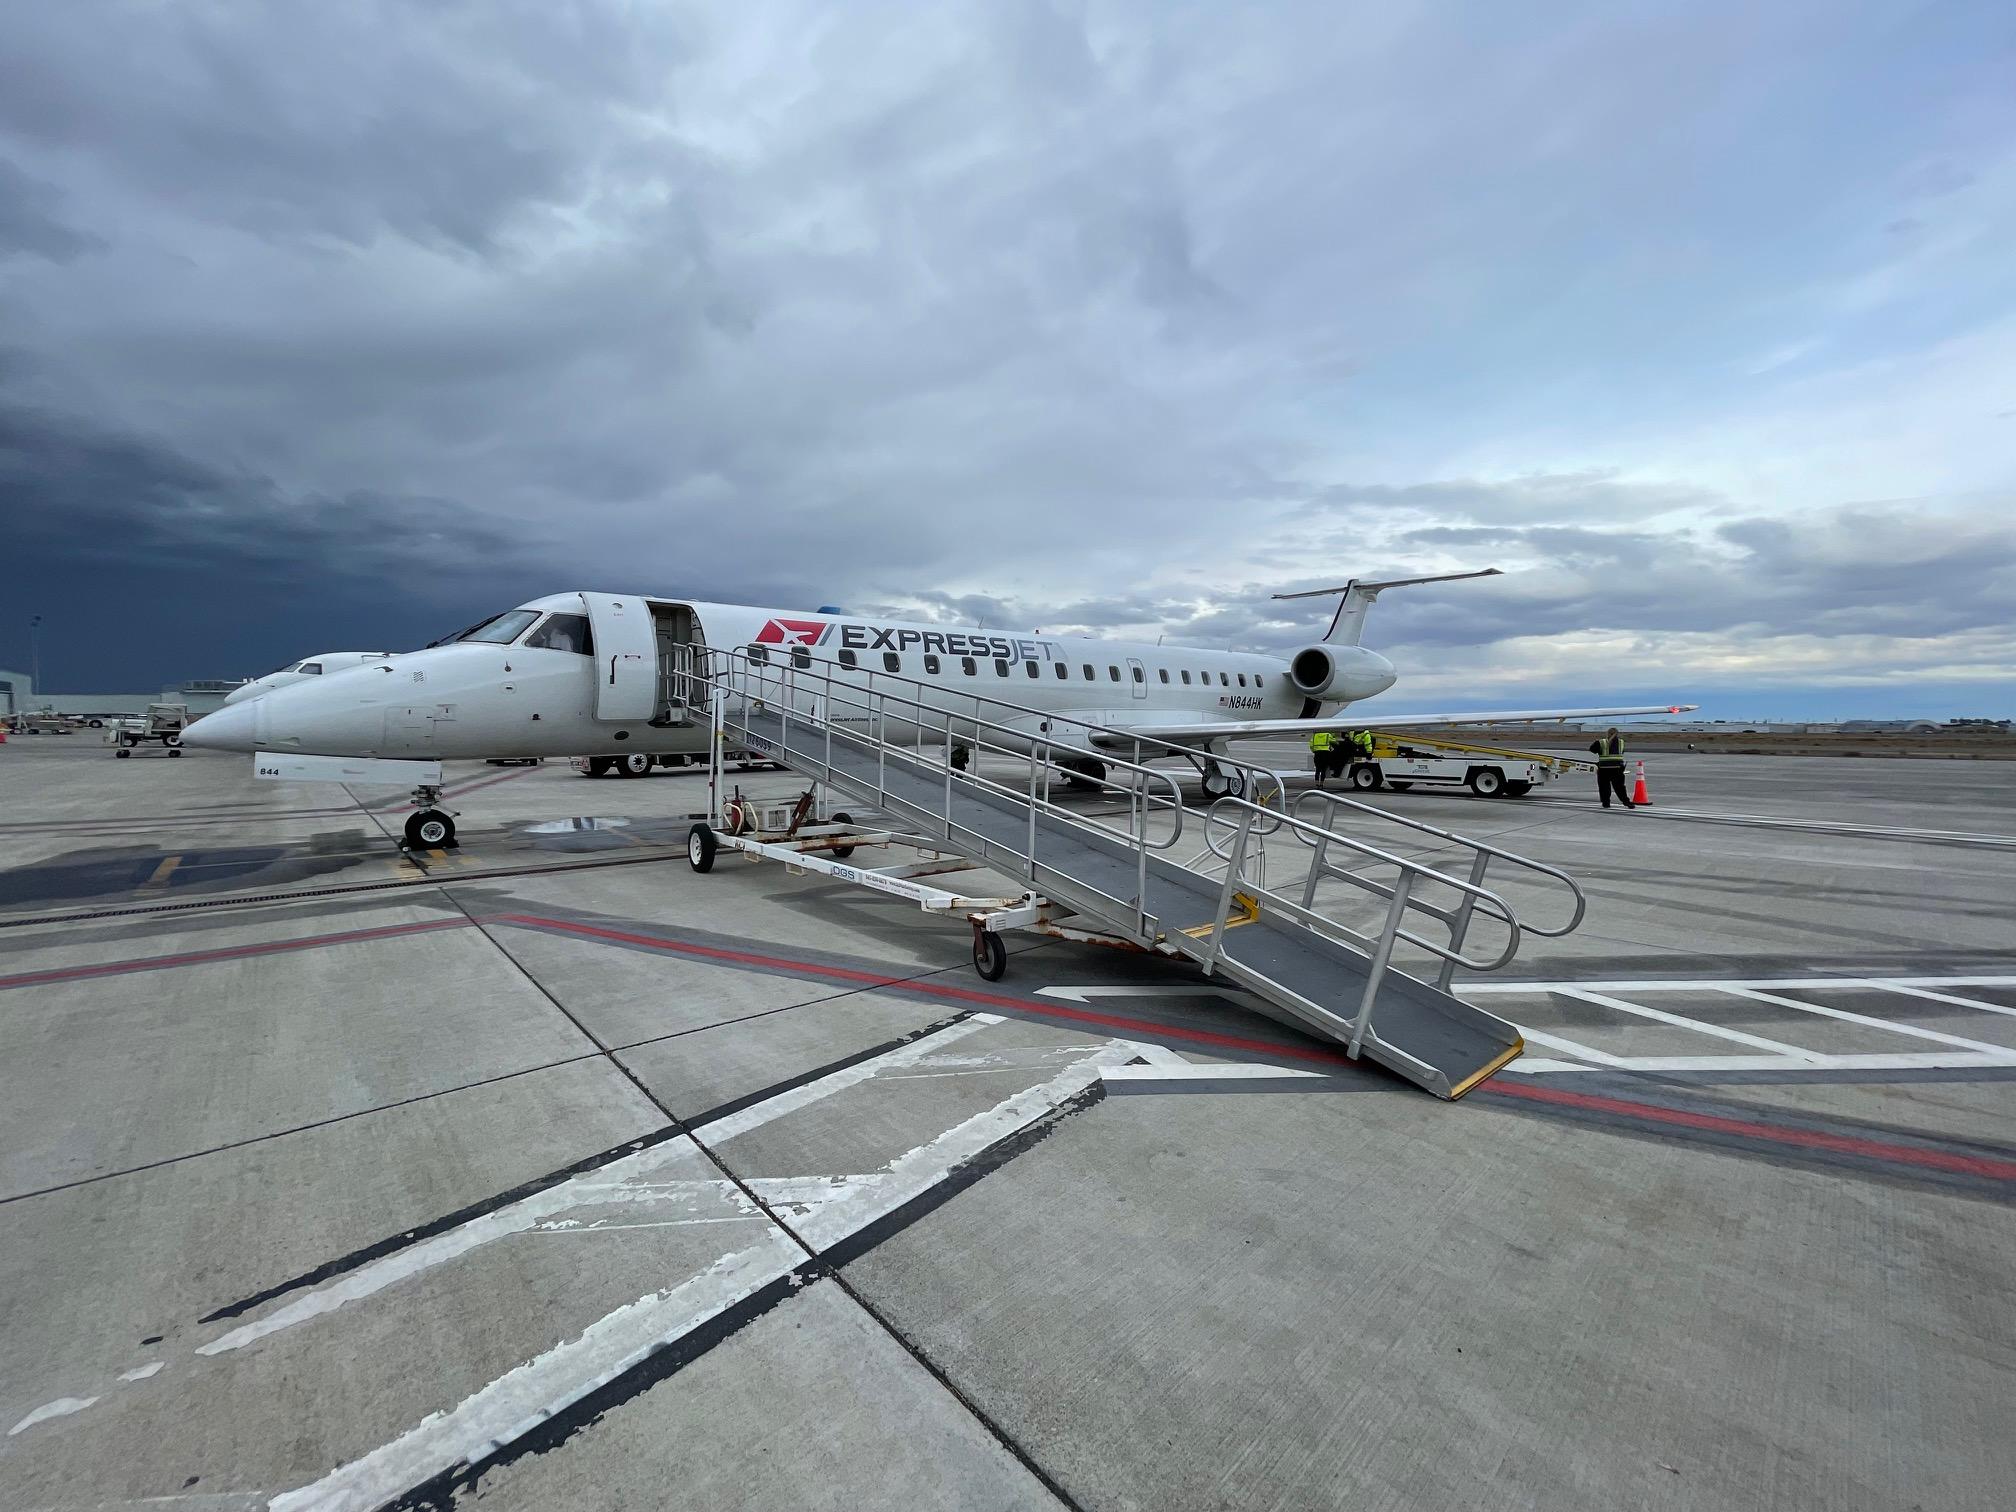 runwaygirlnetwork.com - US airline start-up aha! joins the pack